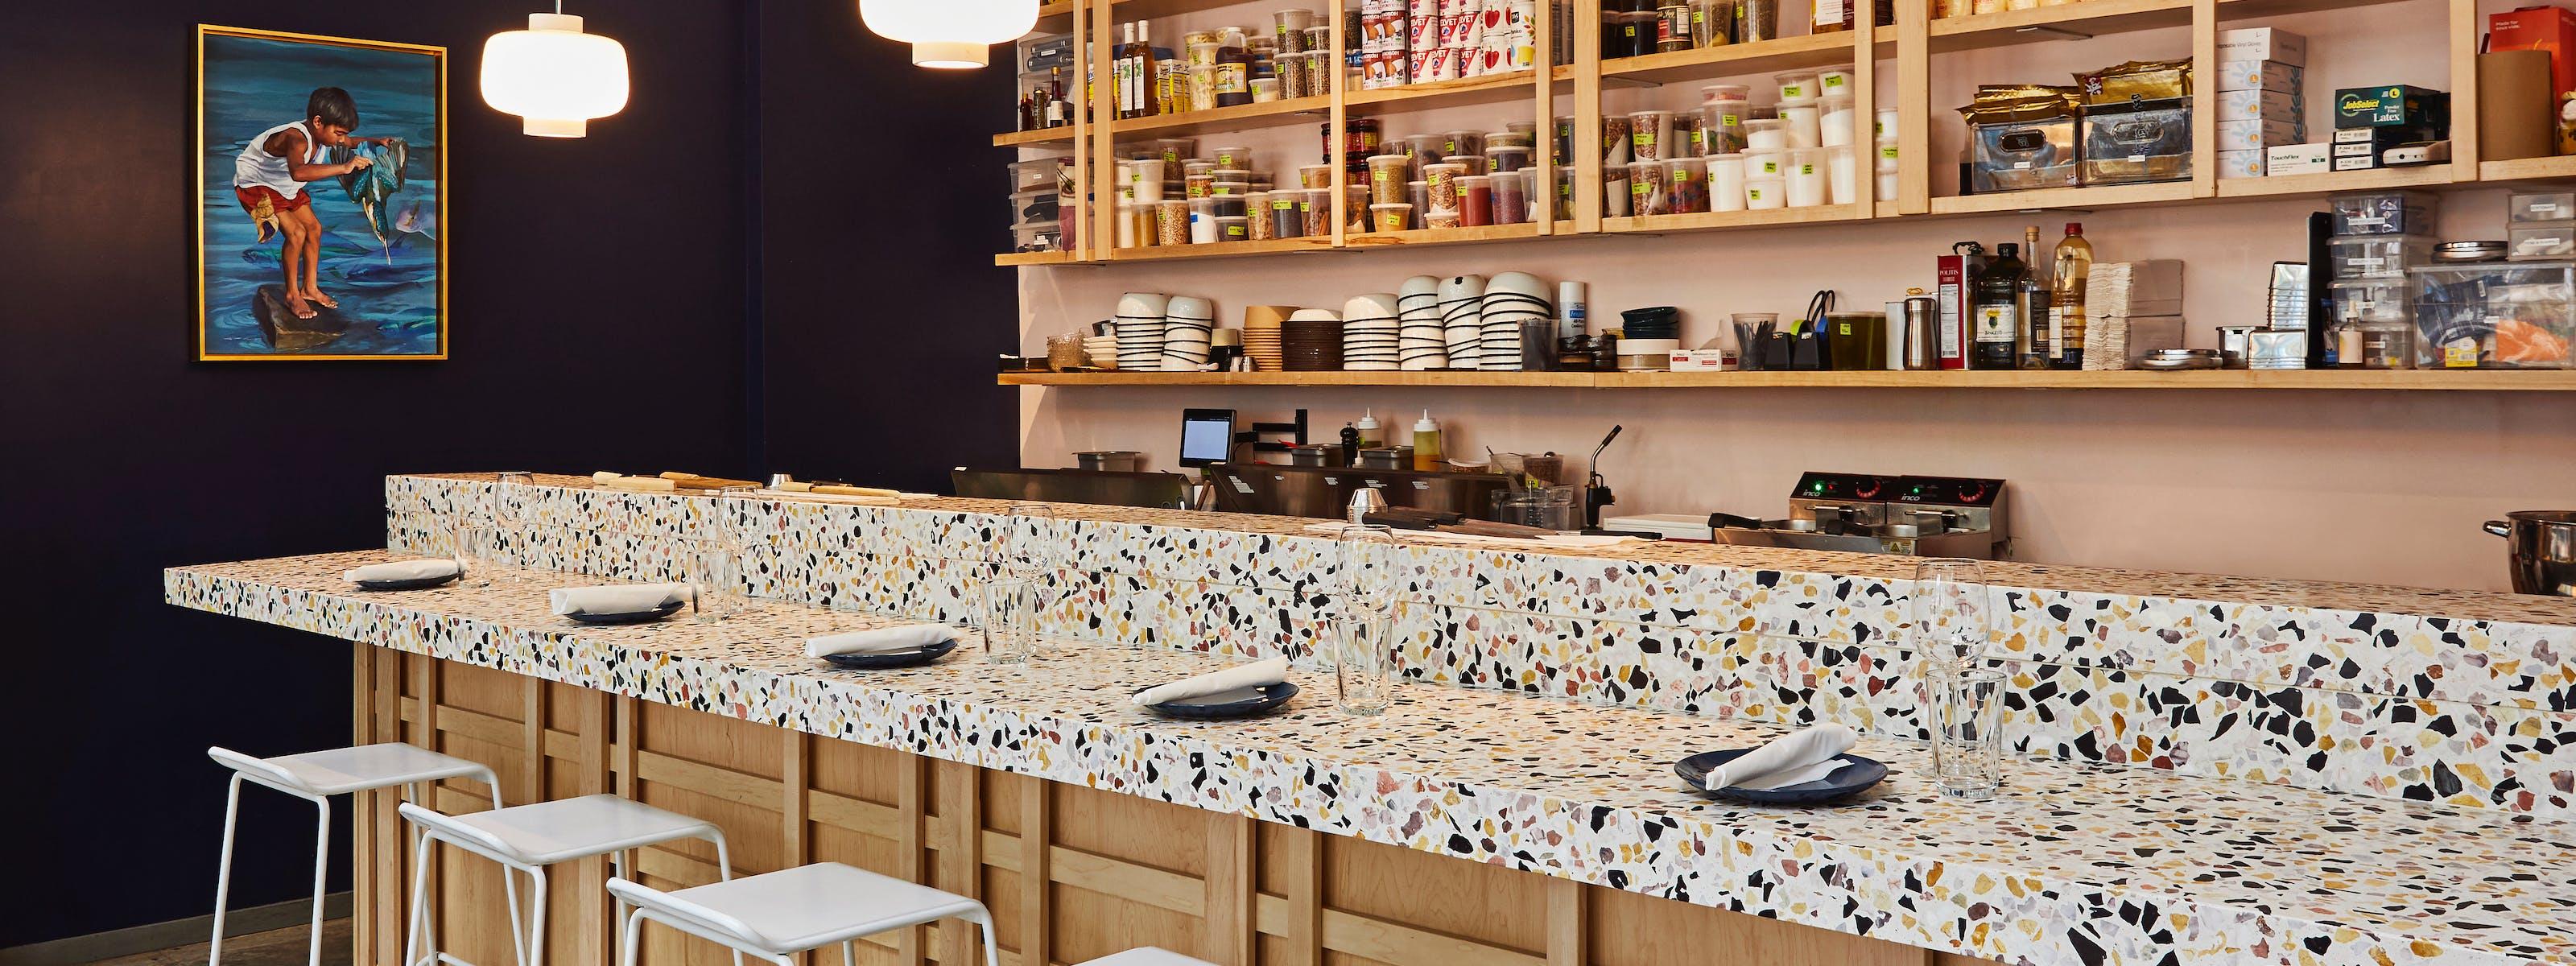 The Best Peruvian Restaurants In Miami - Miami - The Infatuation